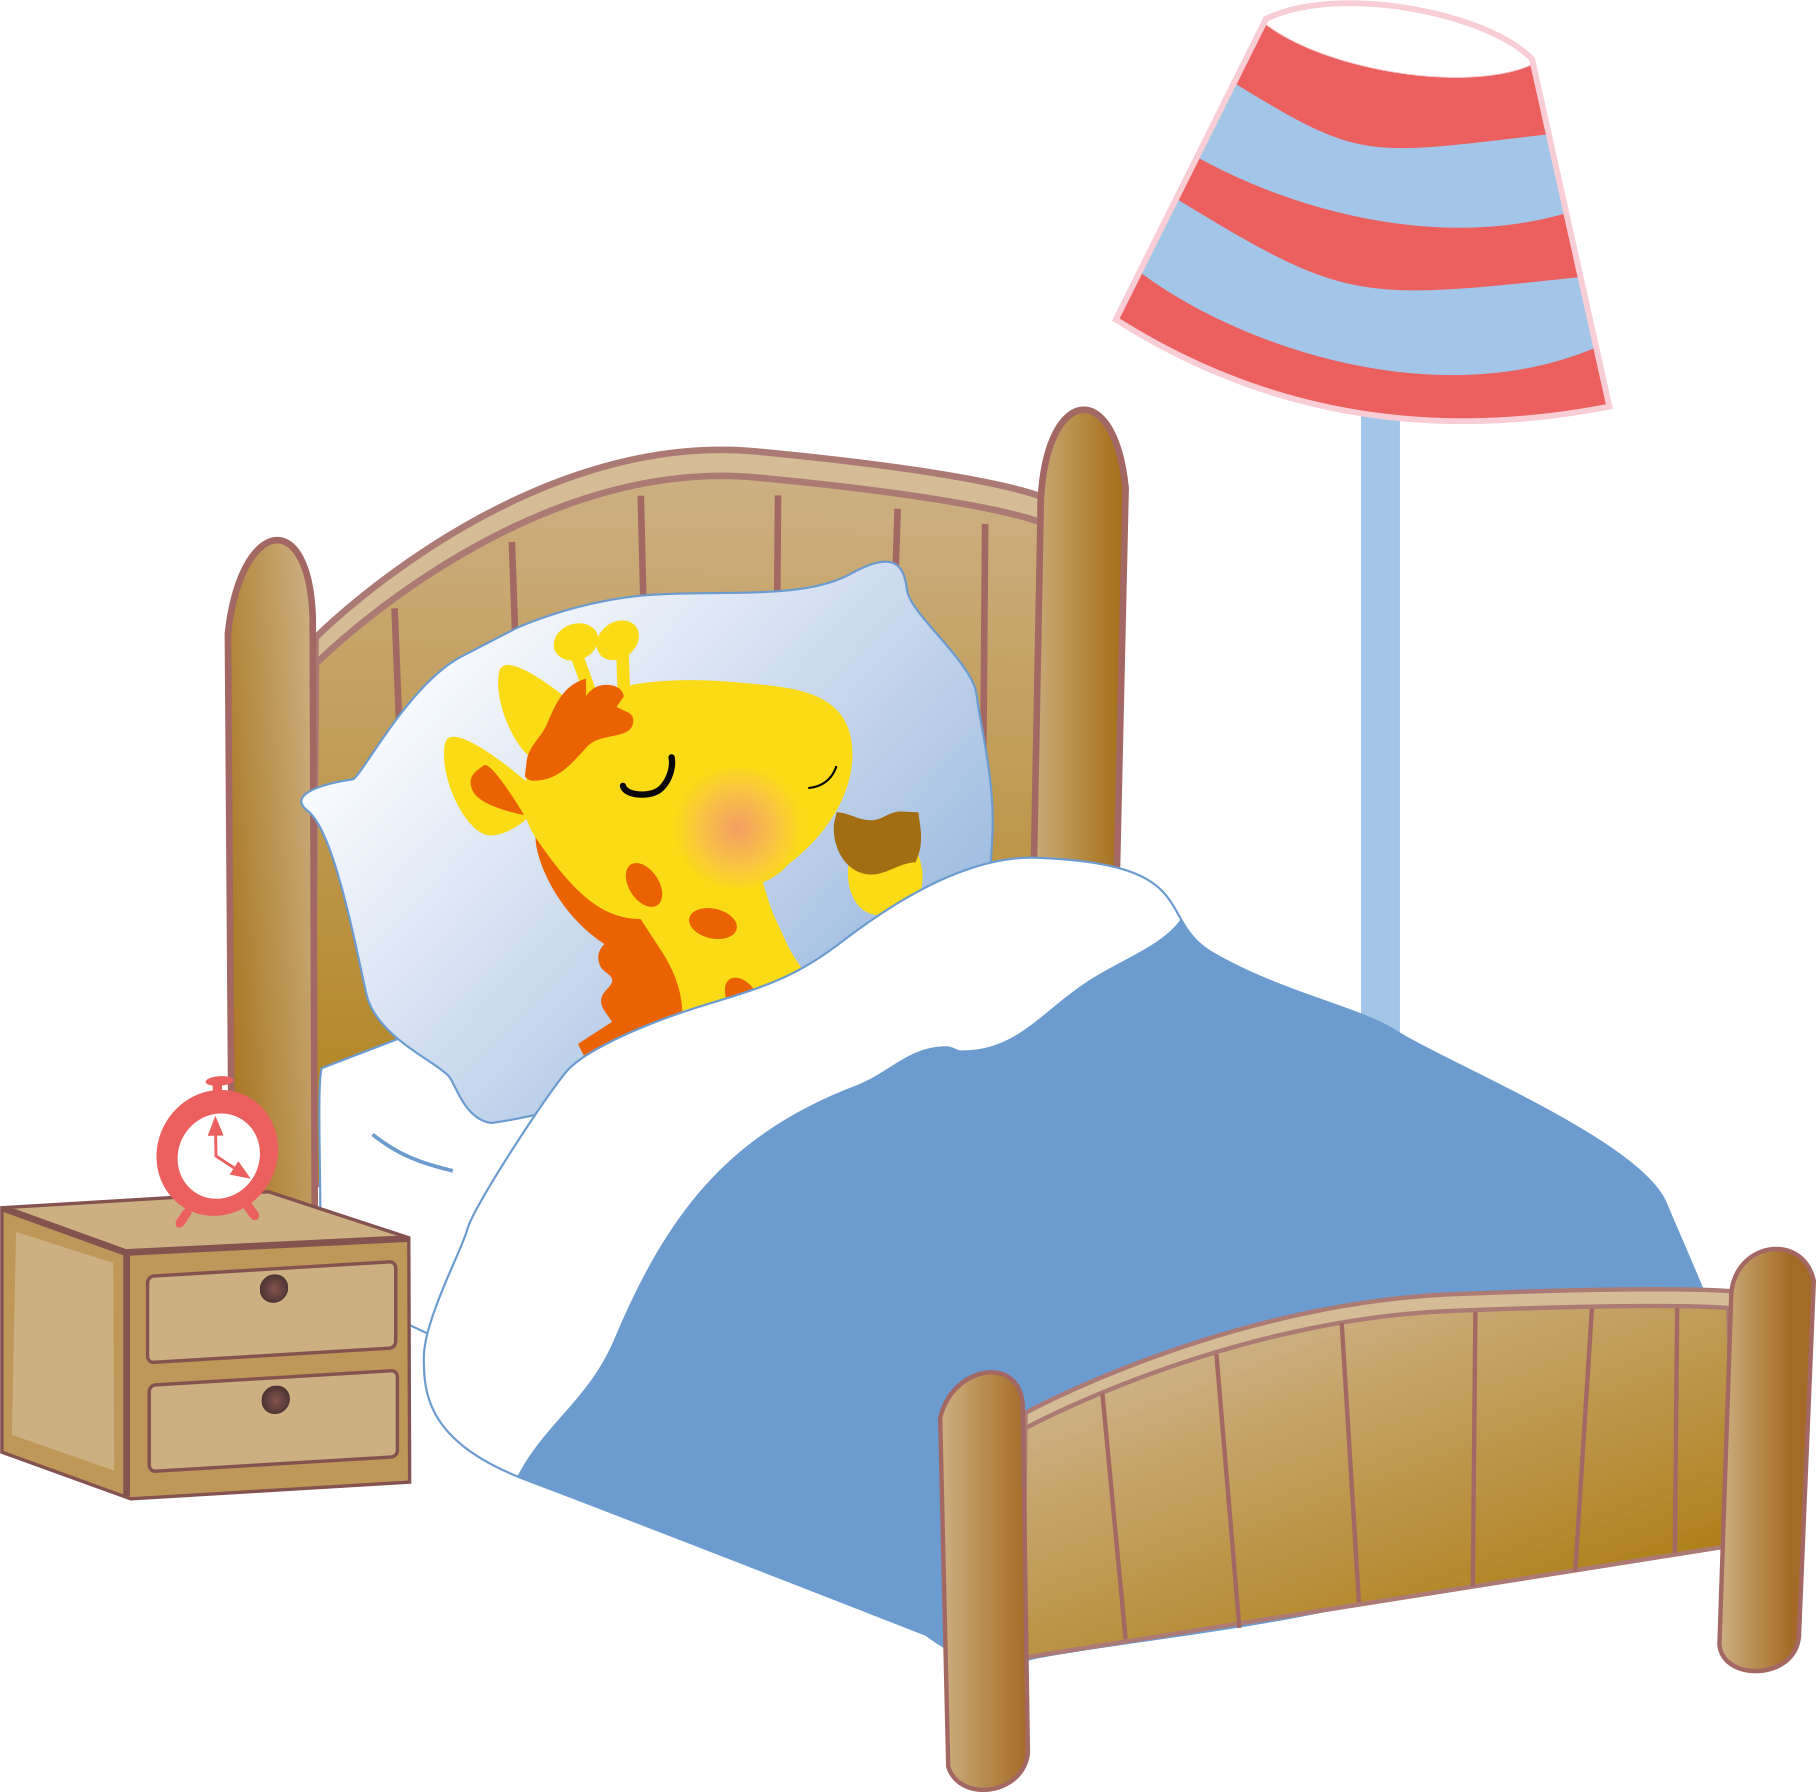 Furniture clipart bedroom thing. Bed giraffe cartoon clip